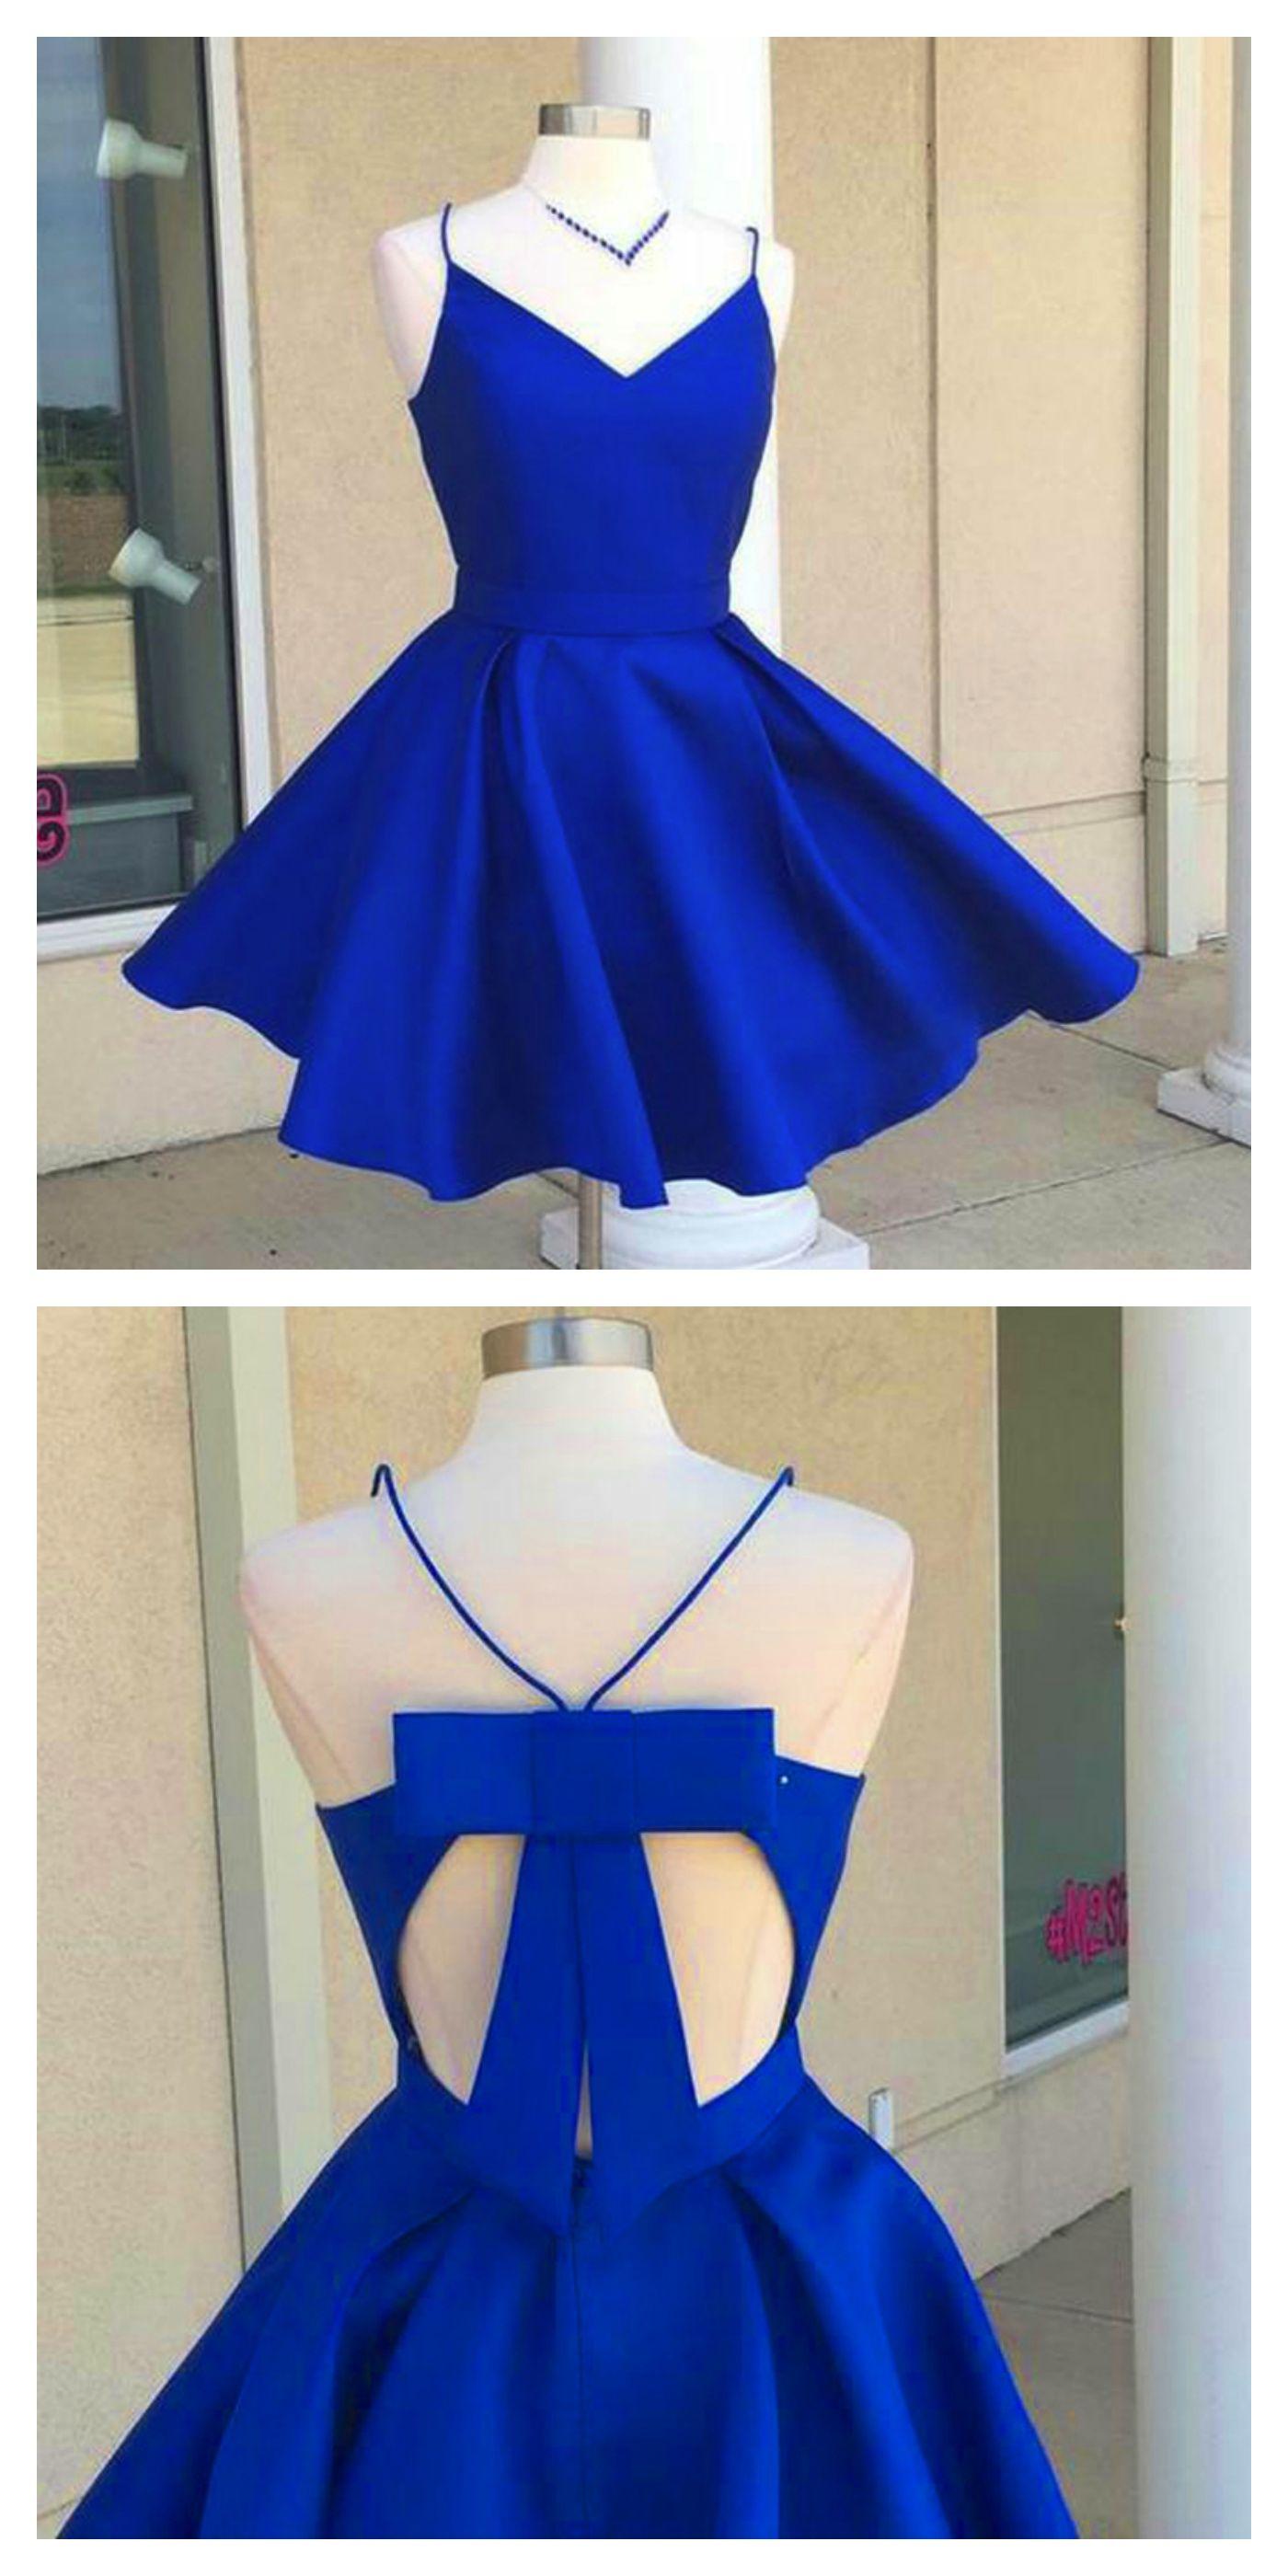 Pin by isabella nitschke on fashion pinterest blue summer